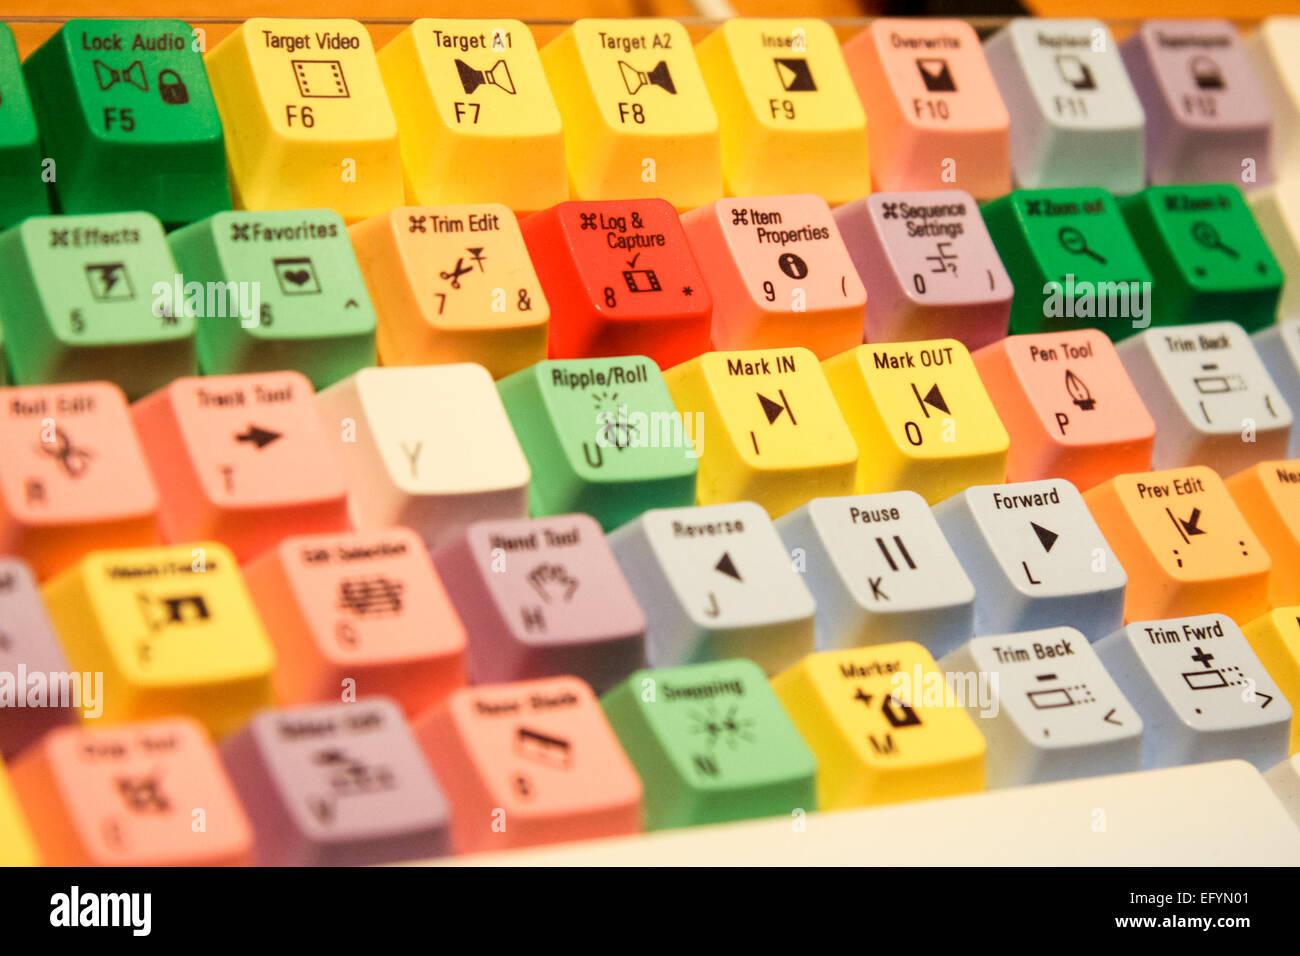 Keys on a video editing keyboard - Stock Image